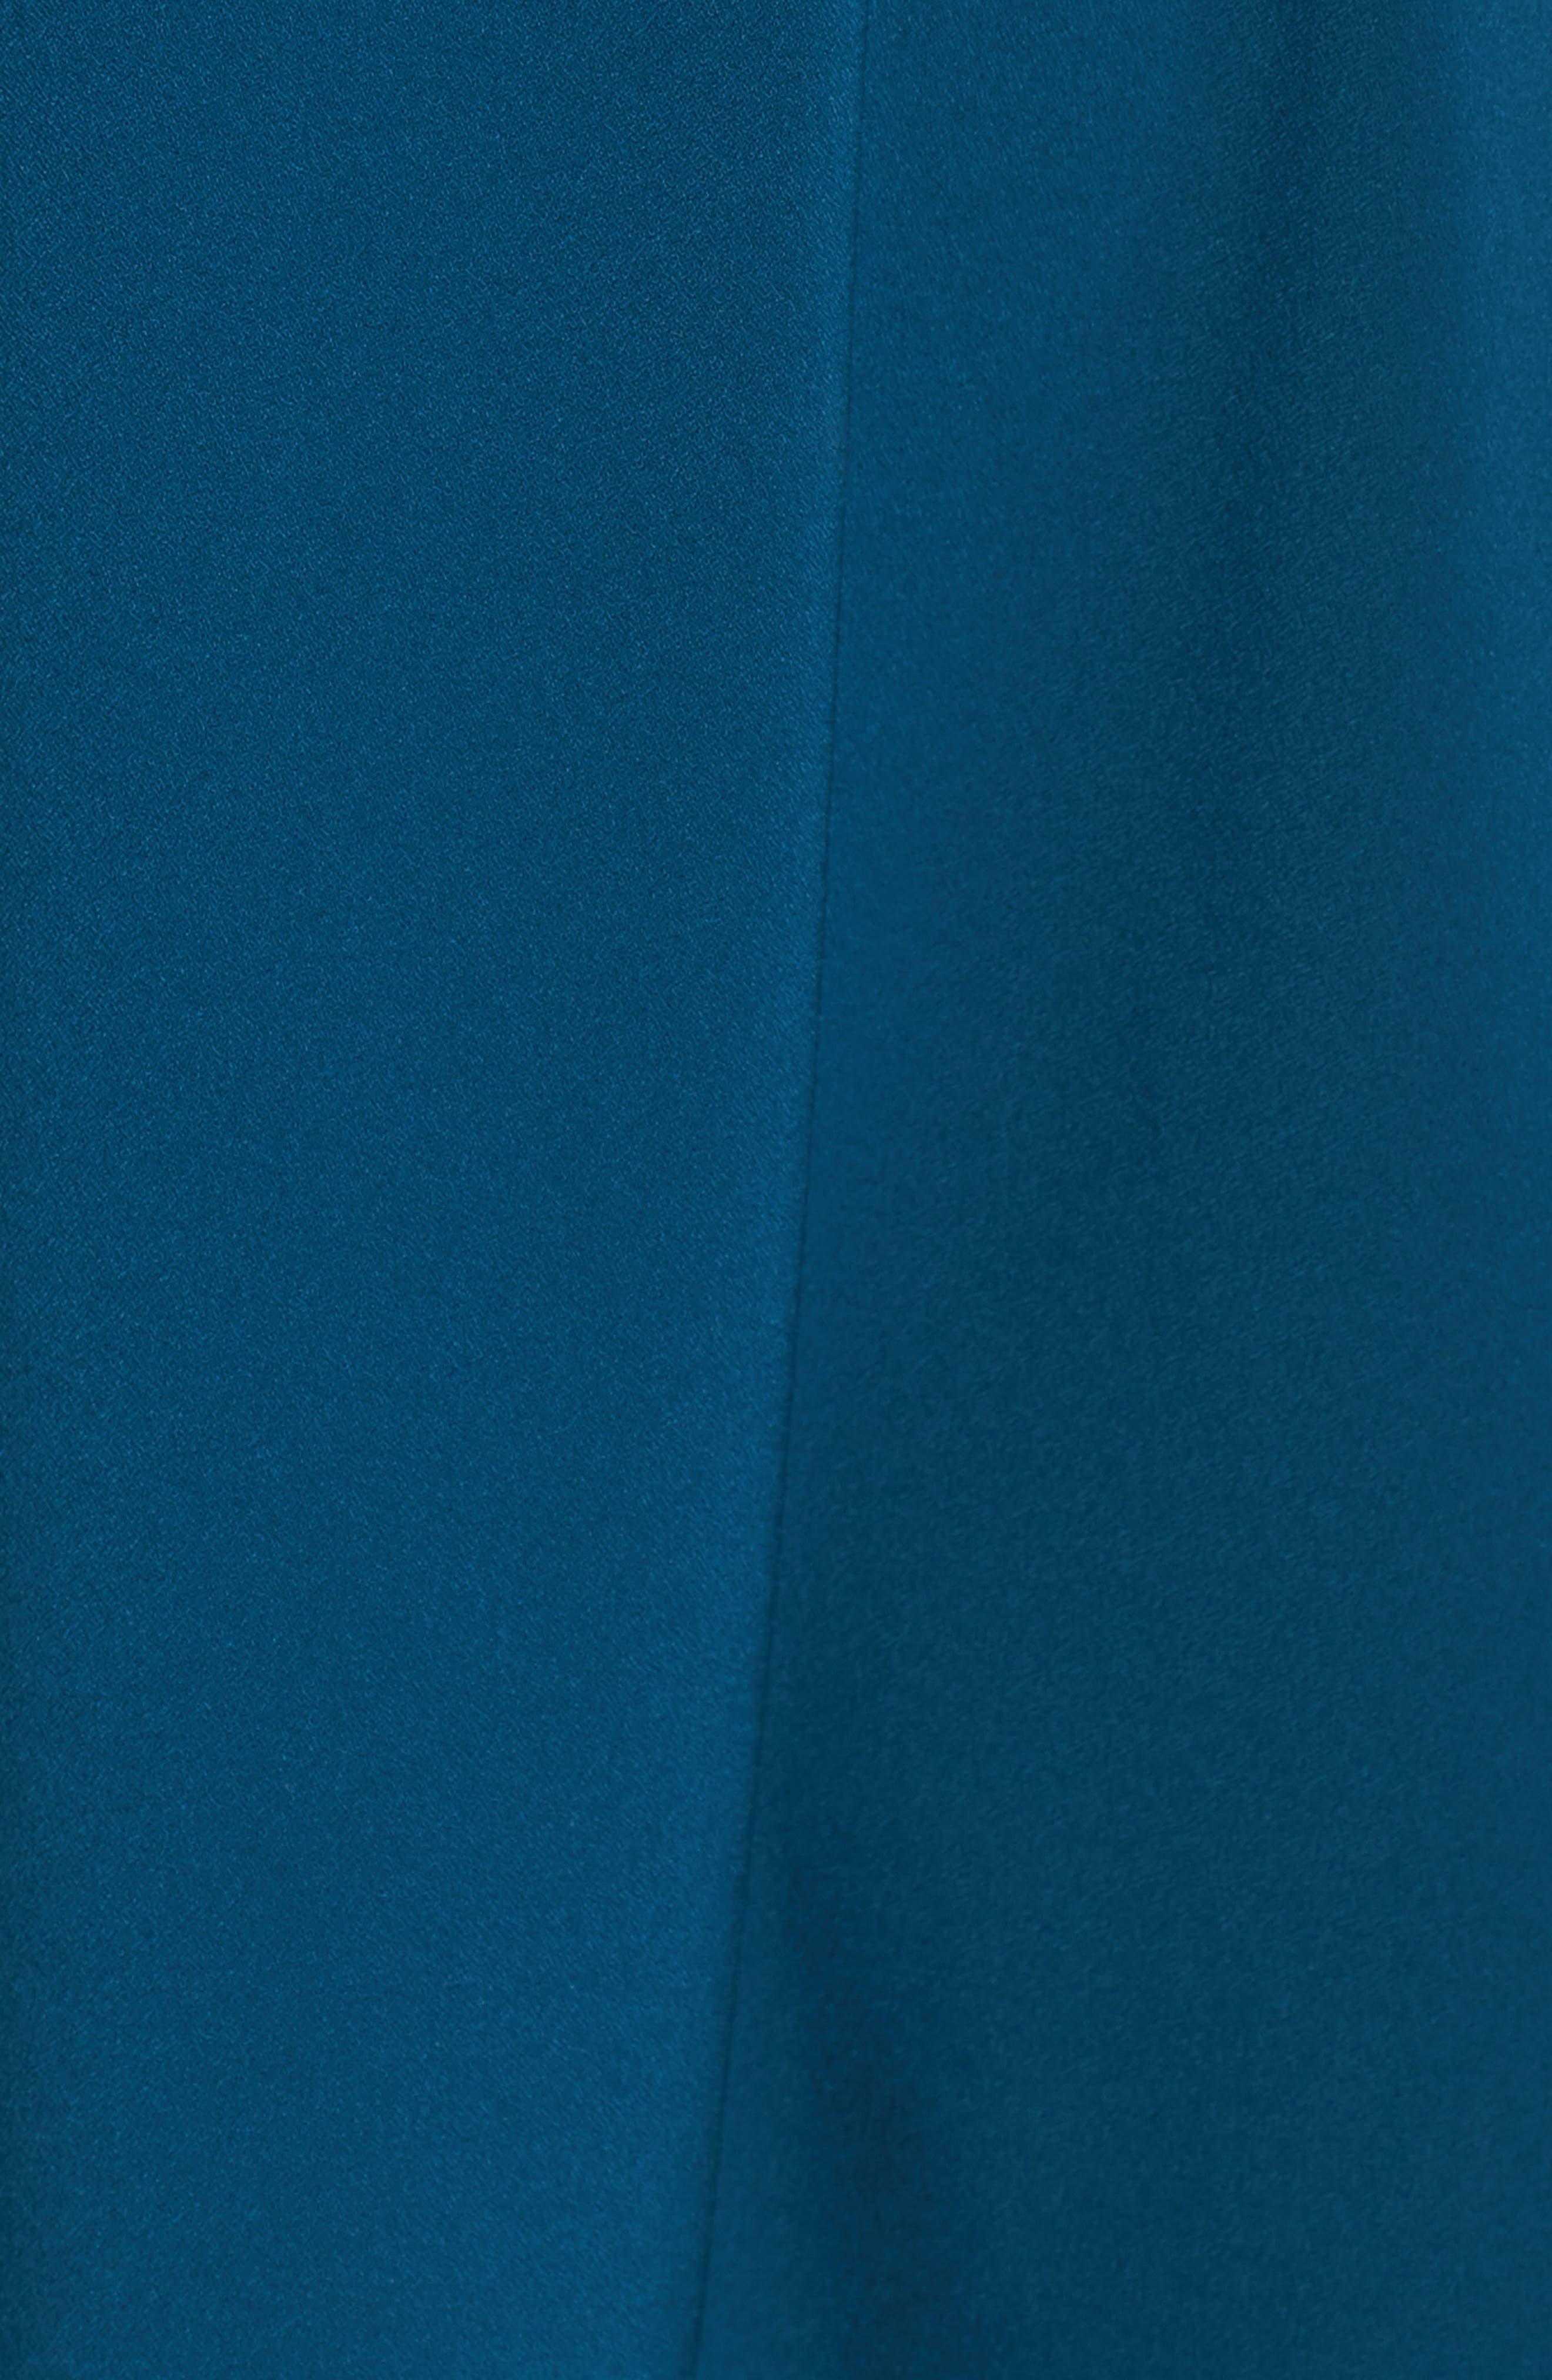 Tie Front Crepe Fit & Flare Dress,                             Alternate thumbnail 10, color,